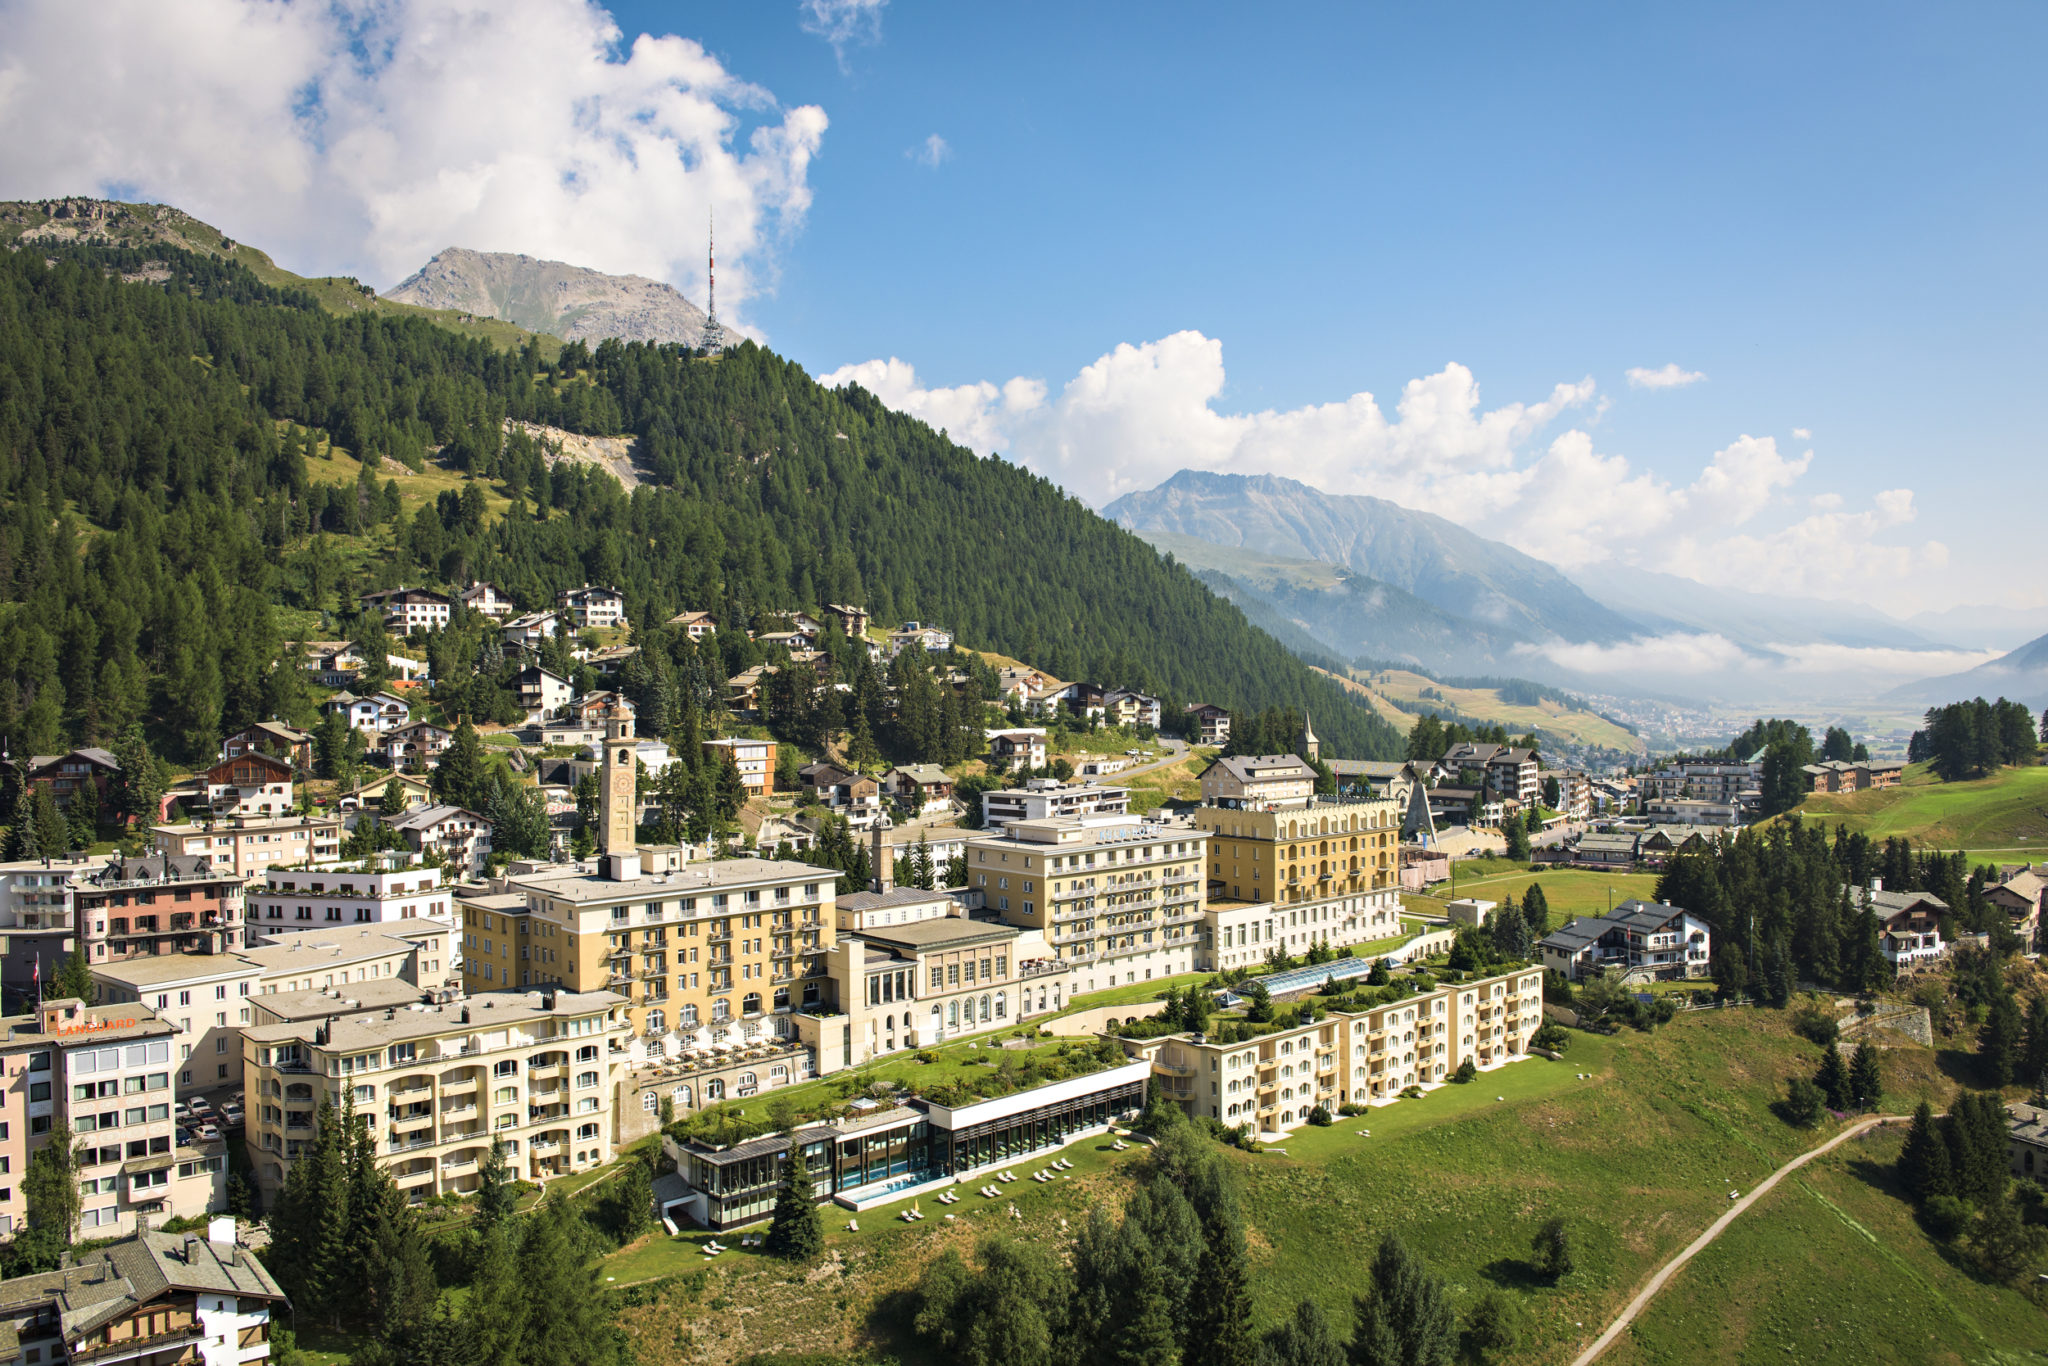 Kulm Hotel, St. Moritz in Switzerland